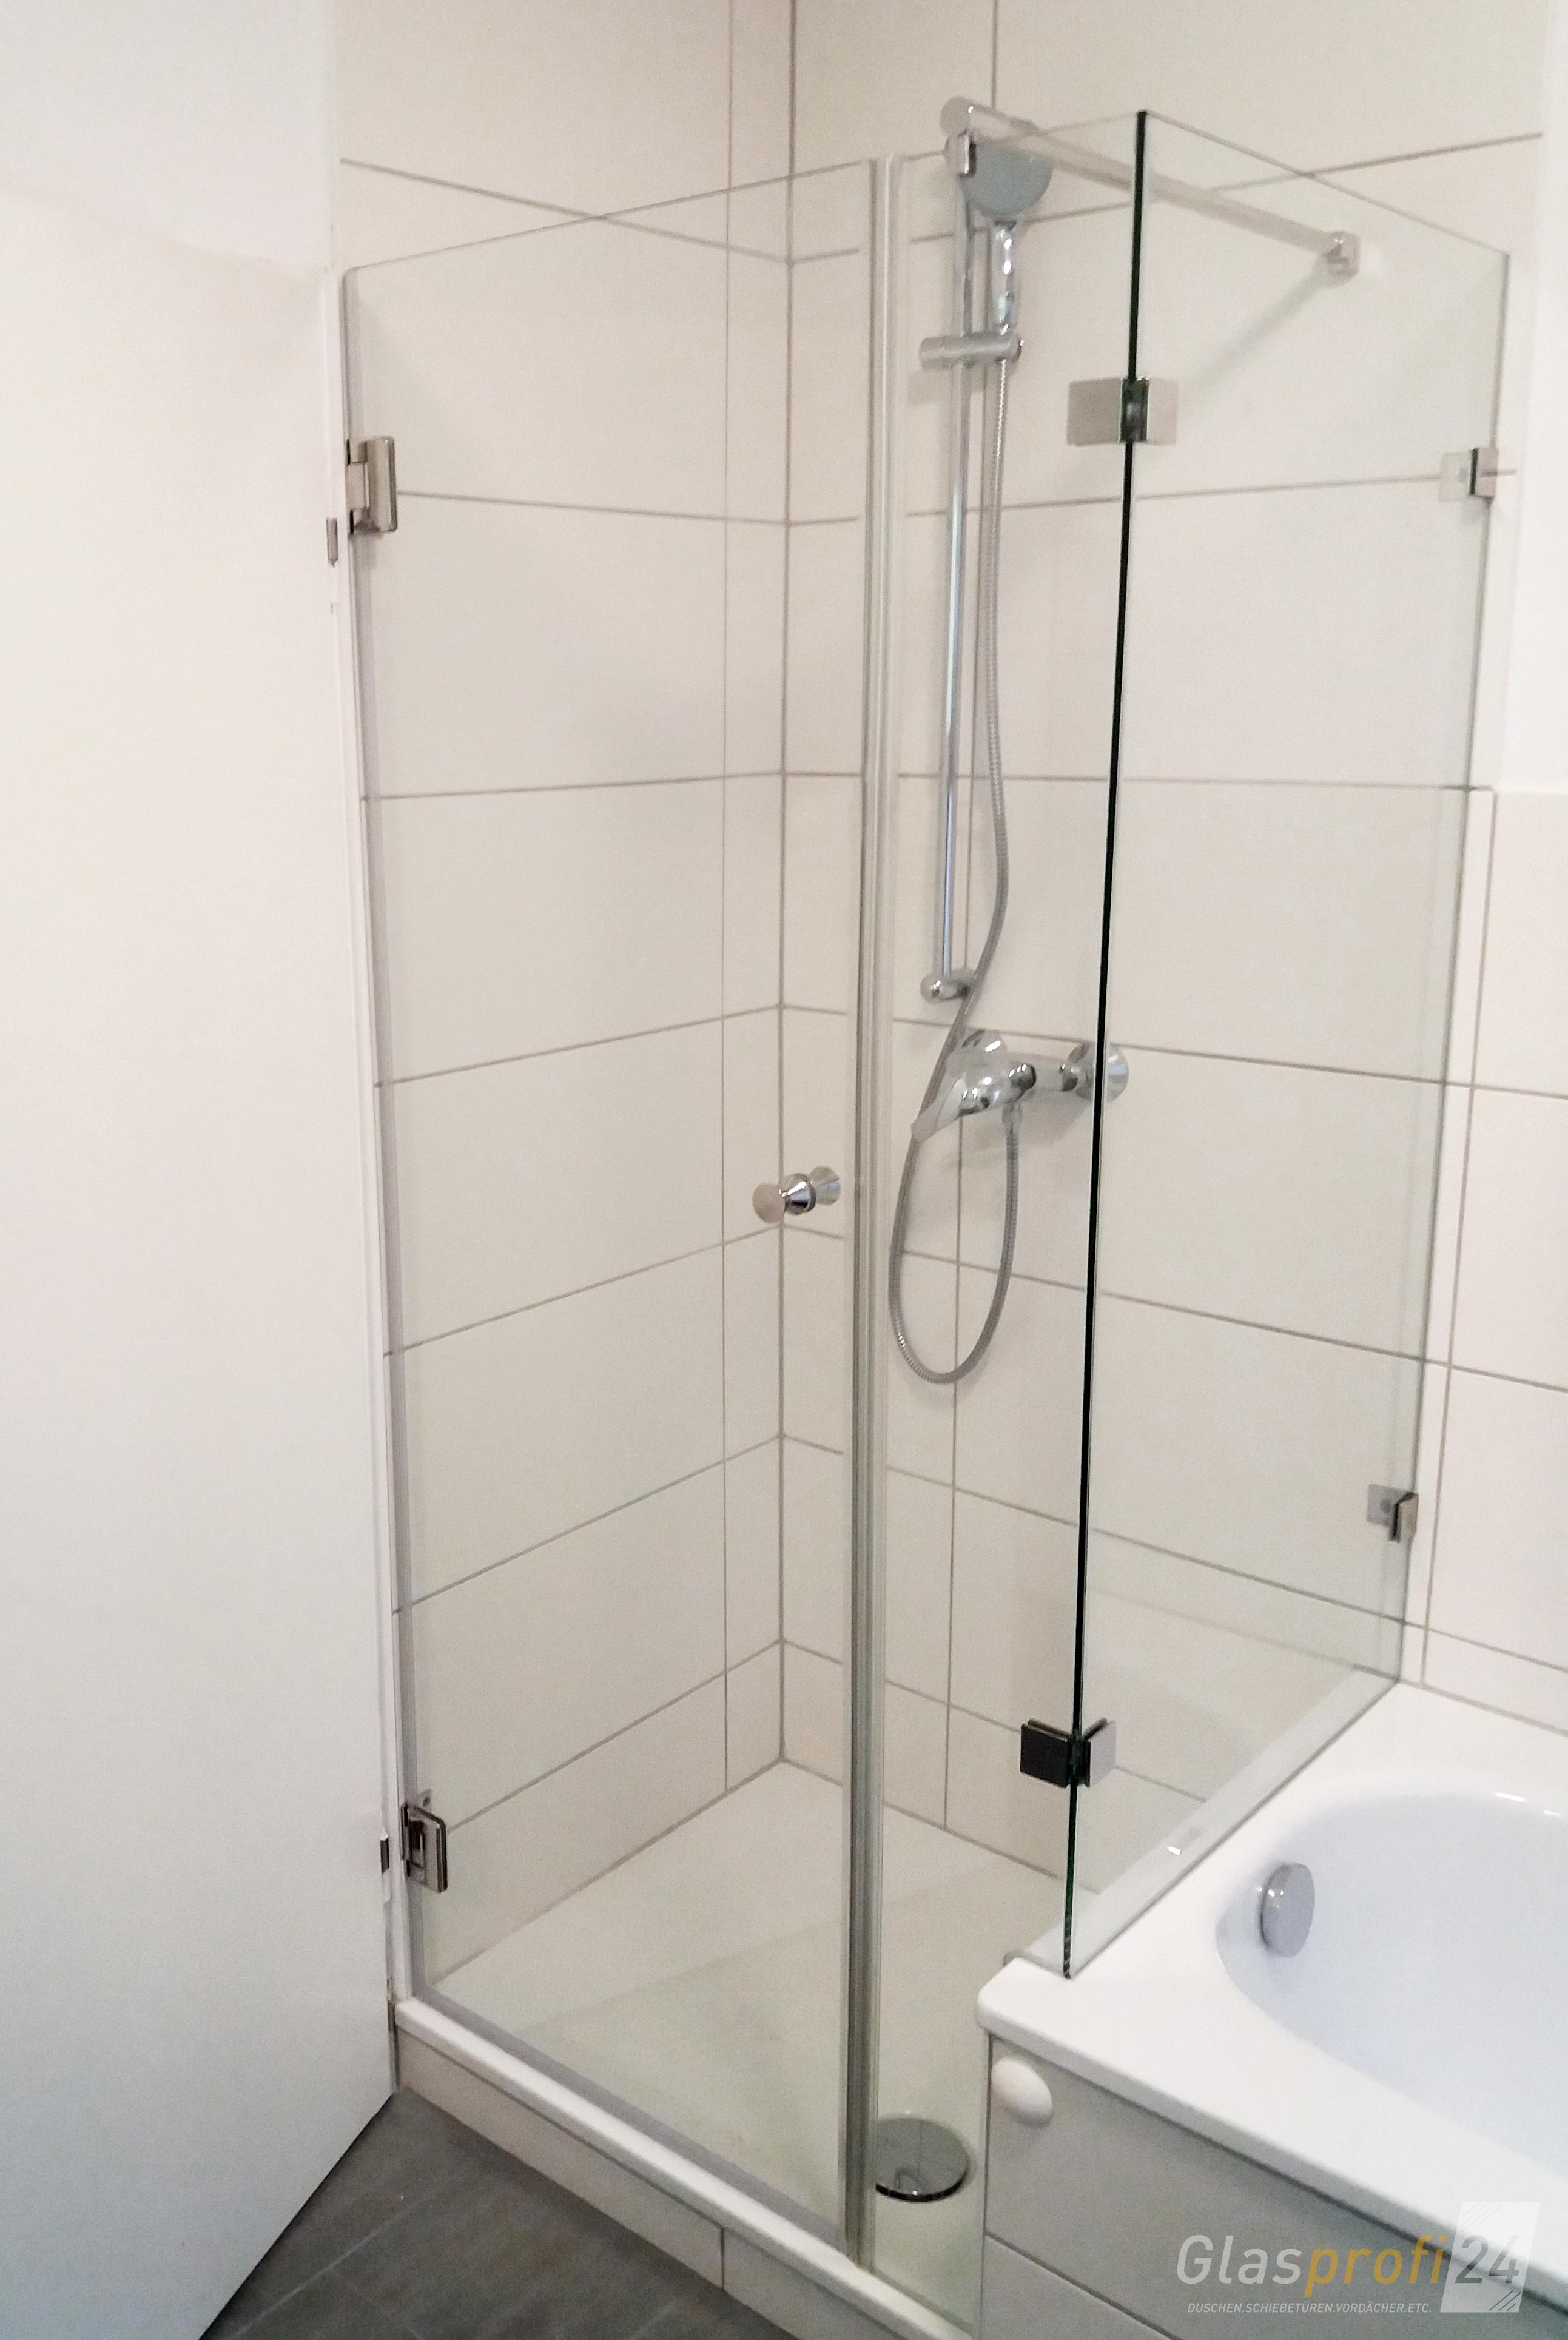 dusche an badewanne glasprofi24. Black Bedroom Furniture Sets. Home Design Ideas